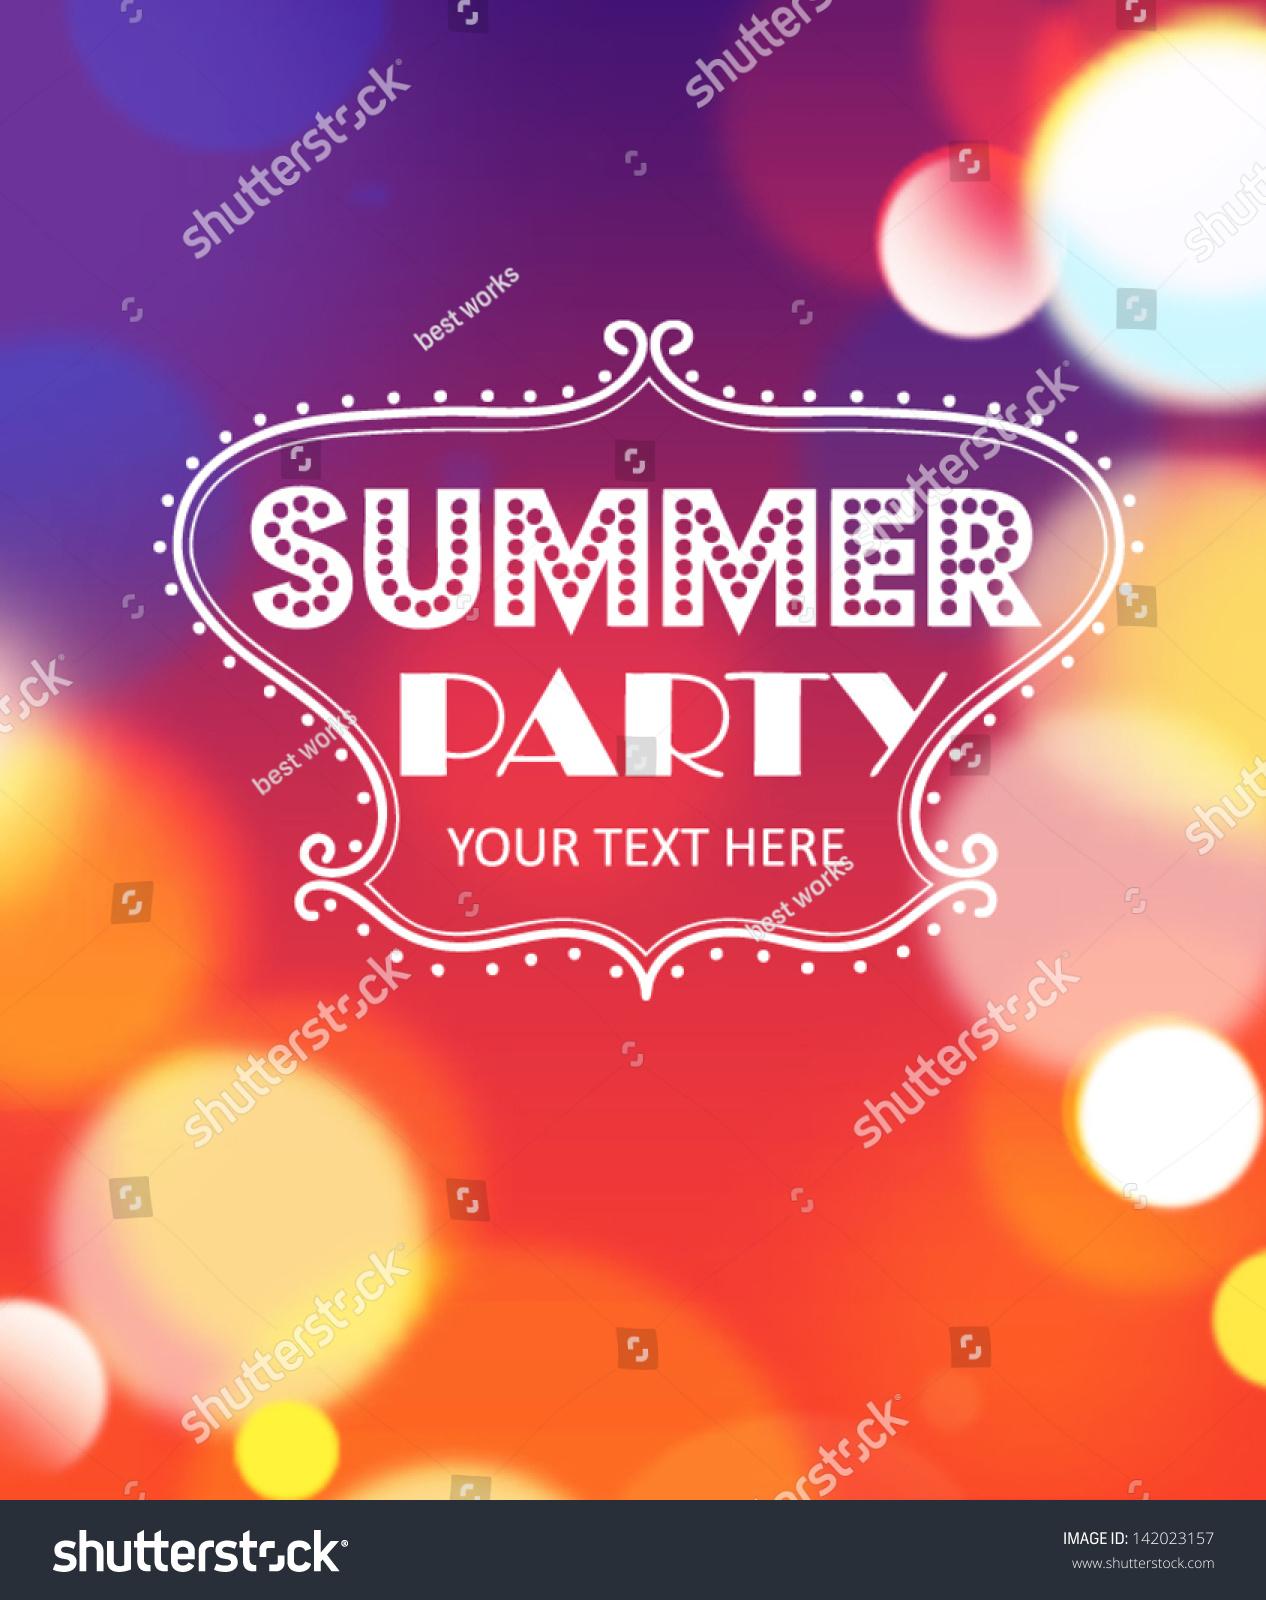 Summer Party Poster Vector 142023157 Shutterstock